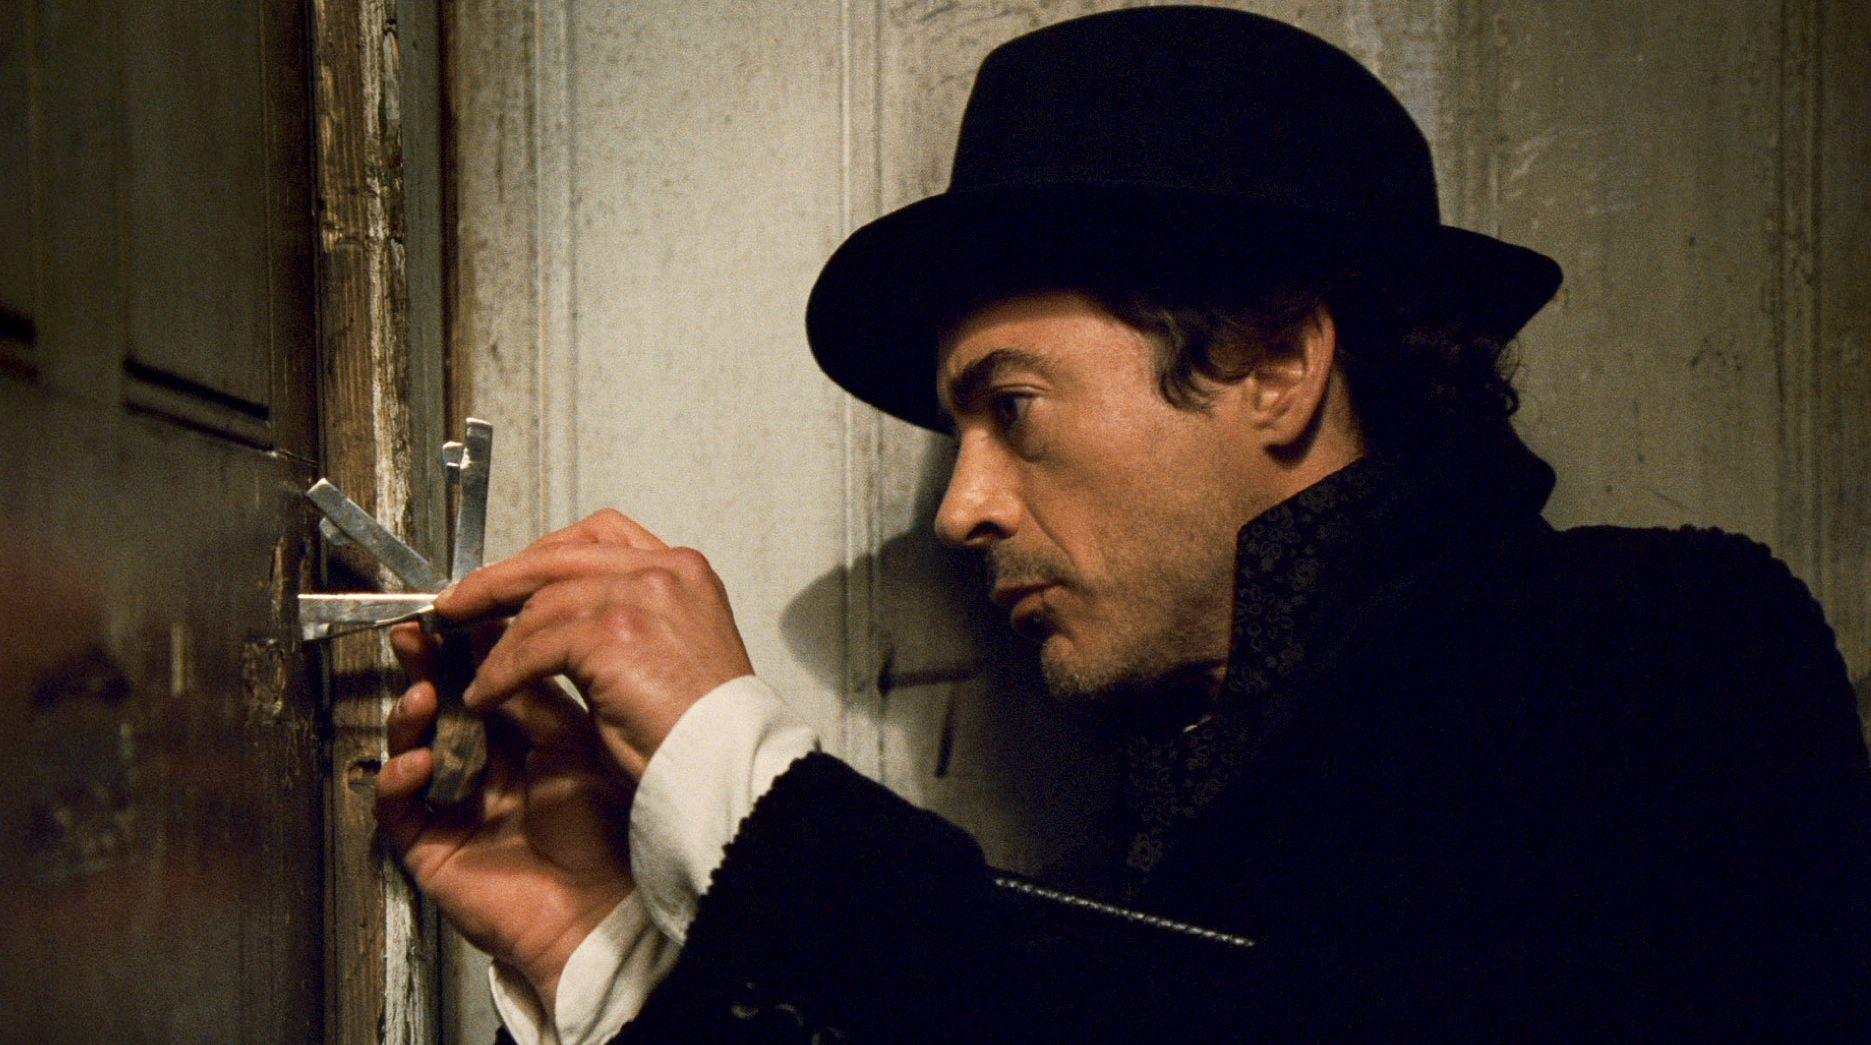 Sherlock Holmes 3 is still Happening, According to Robert